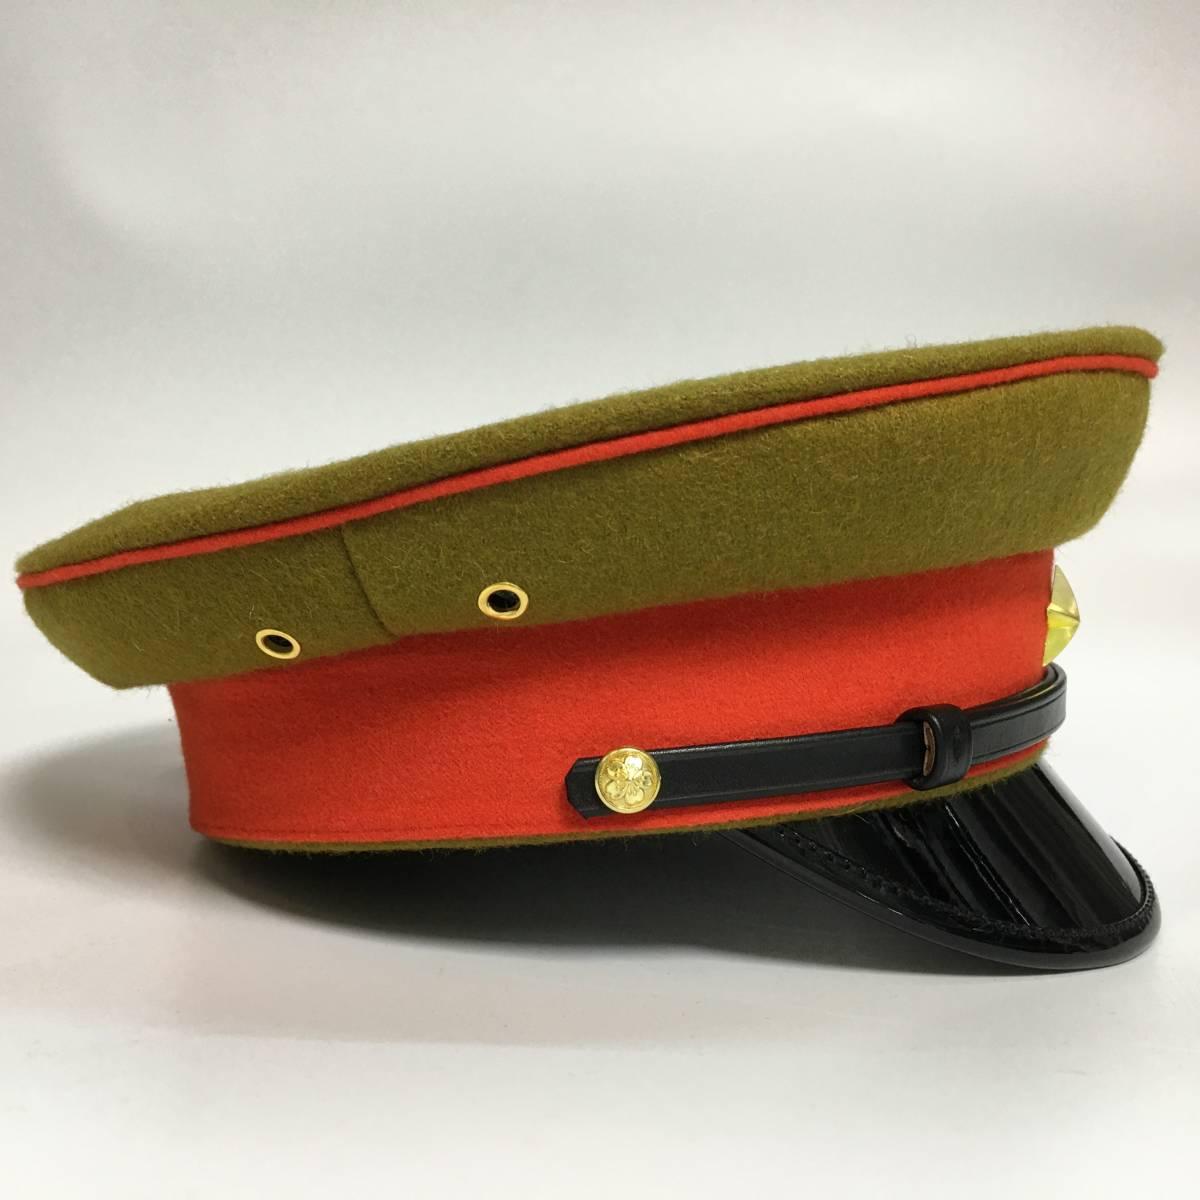 旧日本軍 陸軍将校用制帽 四五式軍帽 ウール製 57cm、58cm、59cm、60cm、61cm レプリカ_画像3